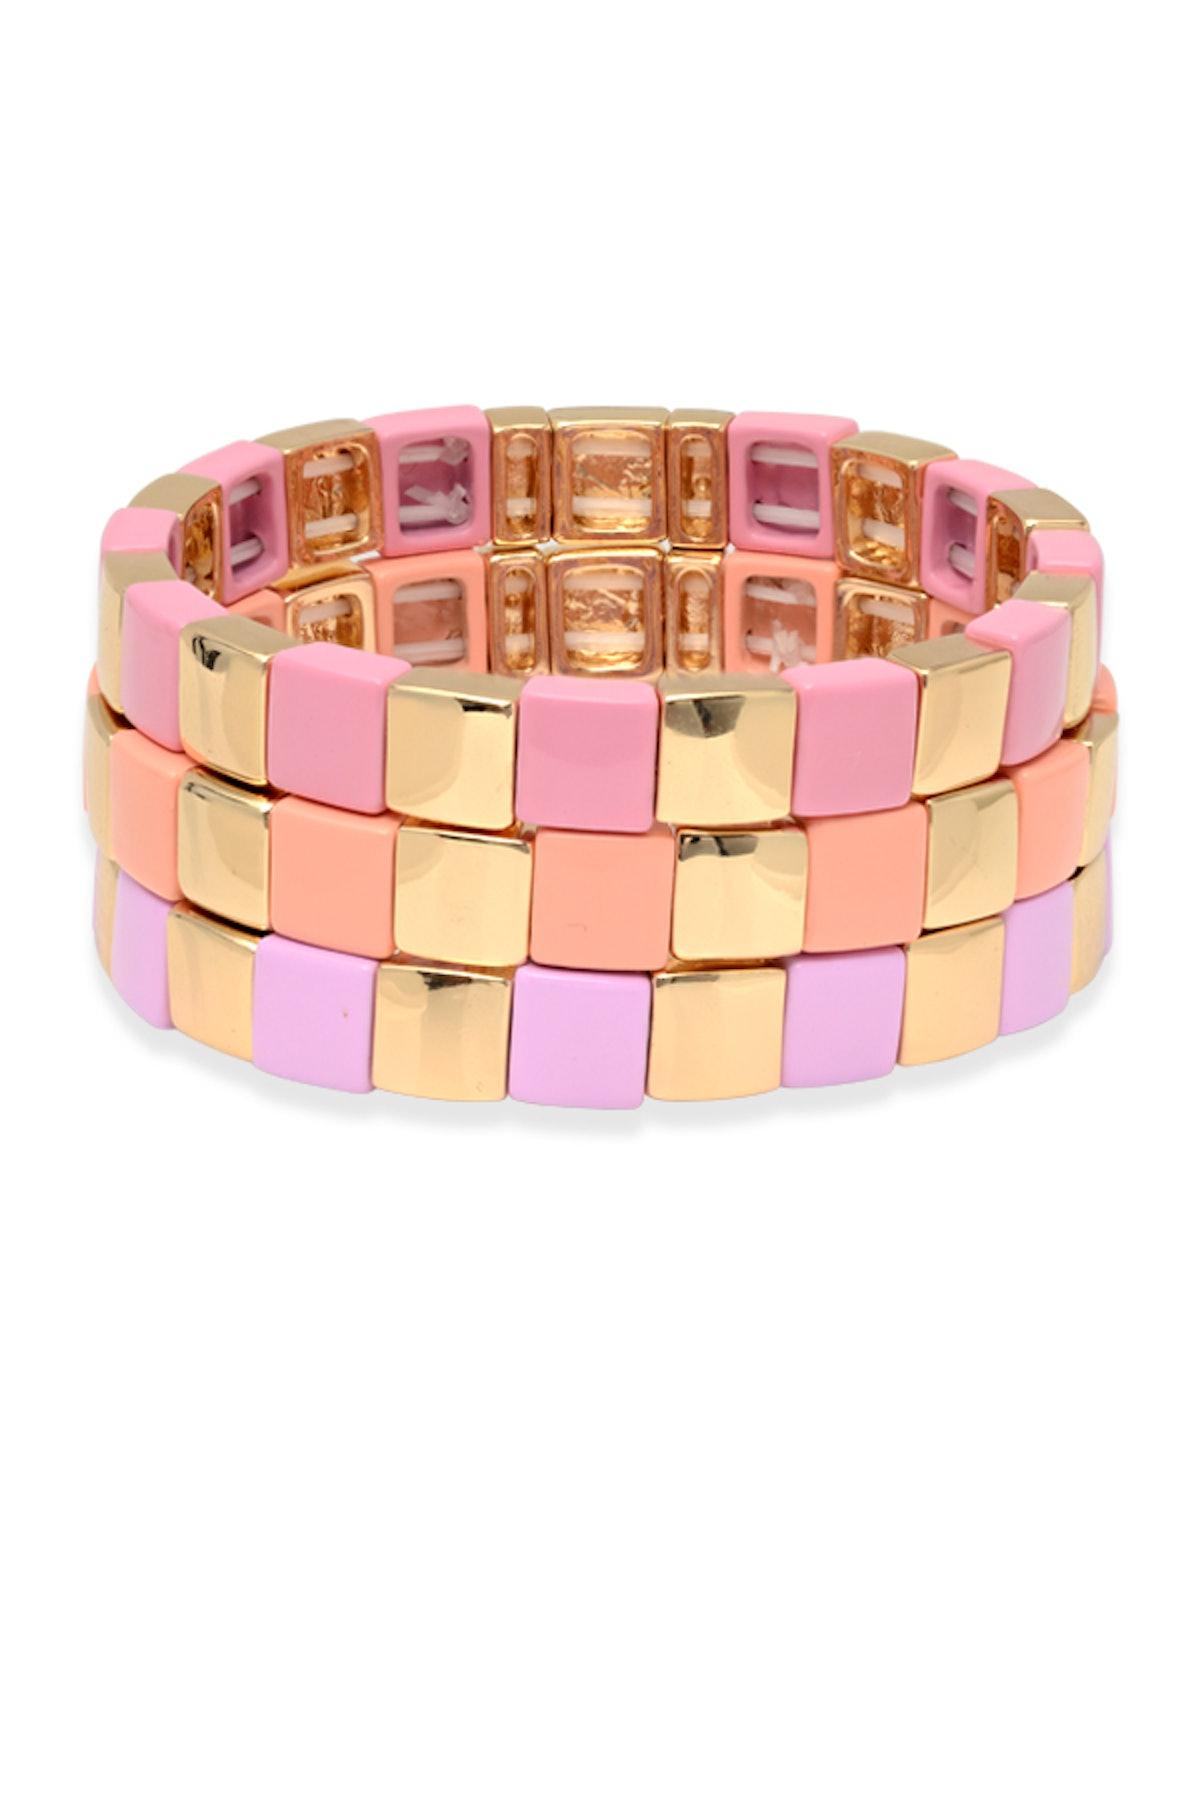 At First Blush Bracelet - Set Of Three